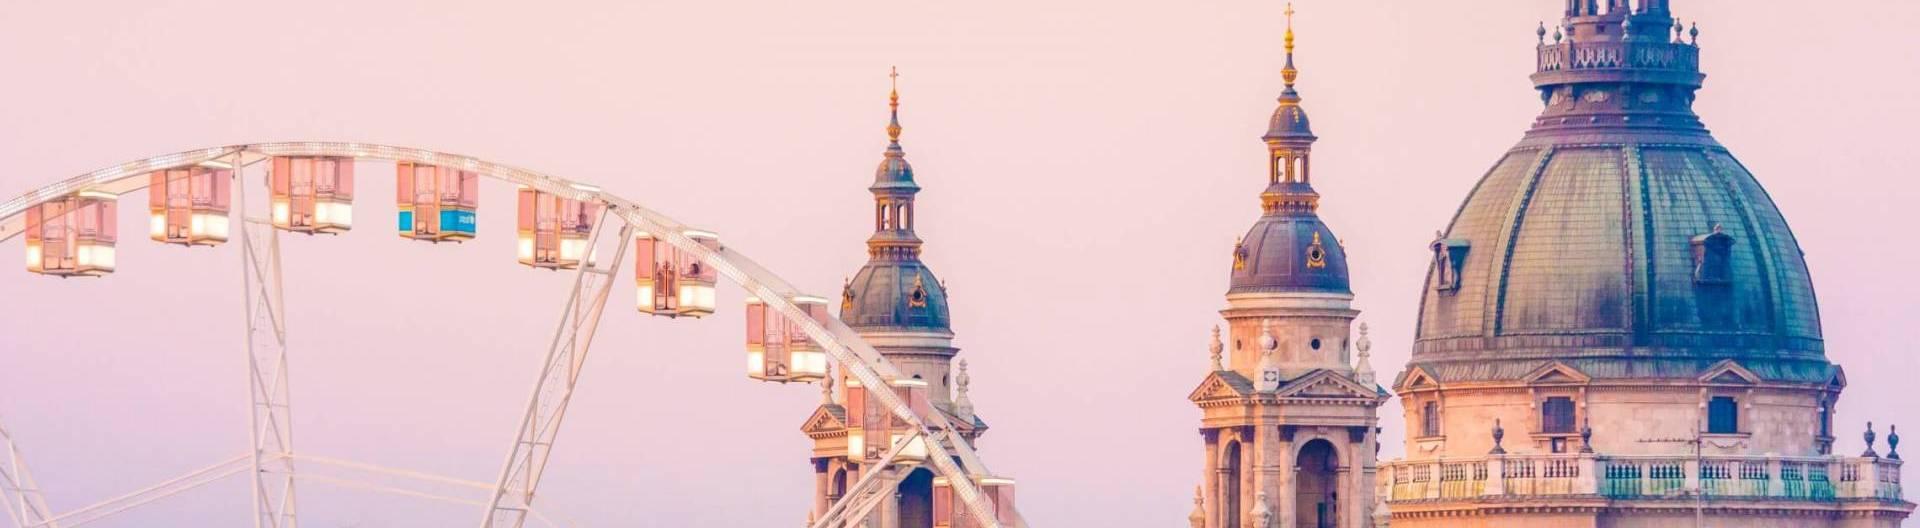 Budapest-Unkari-kirkko_-1920x528.jpg